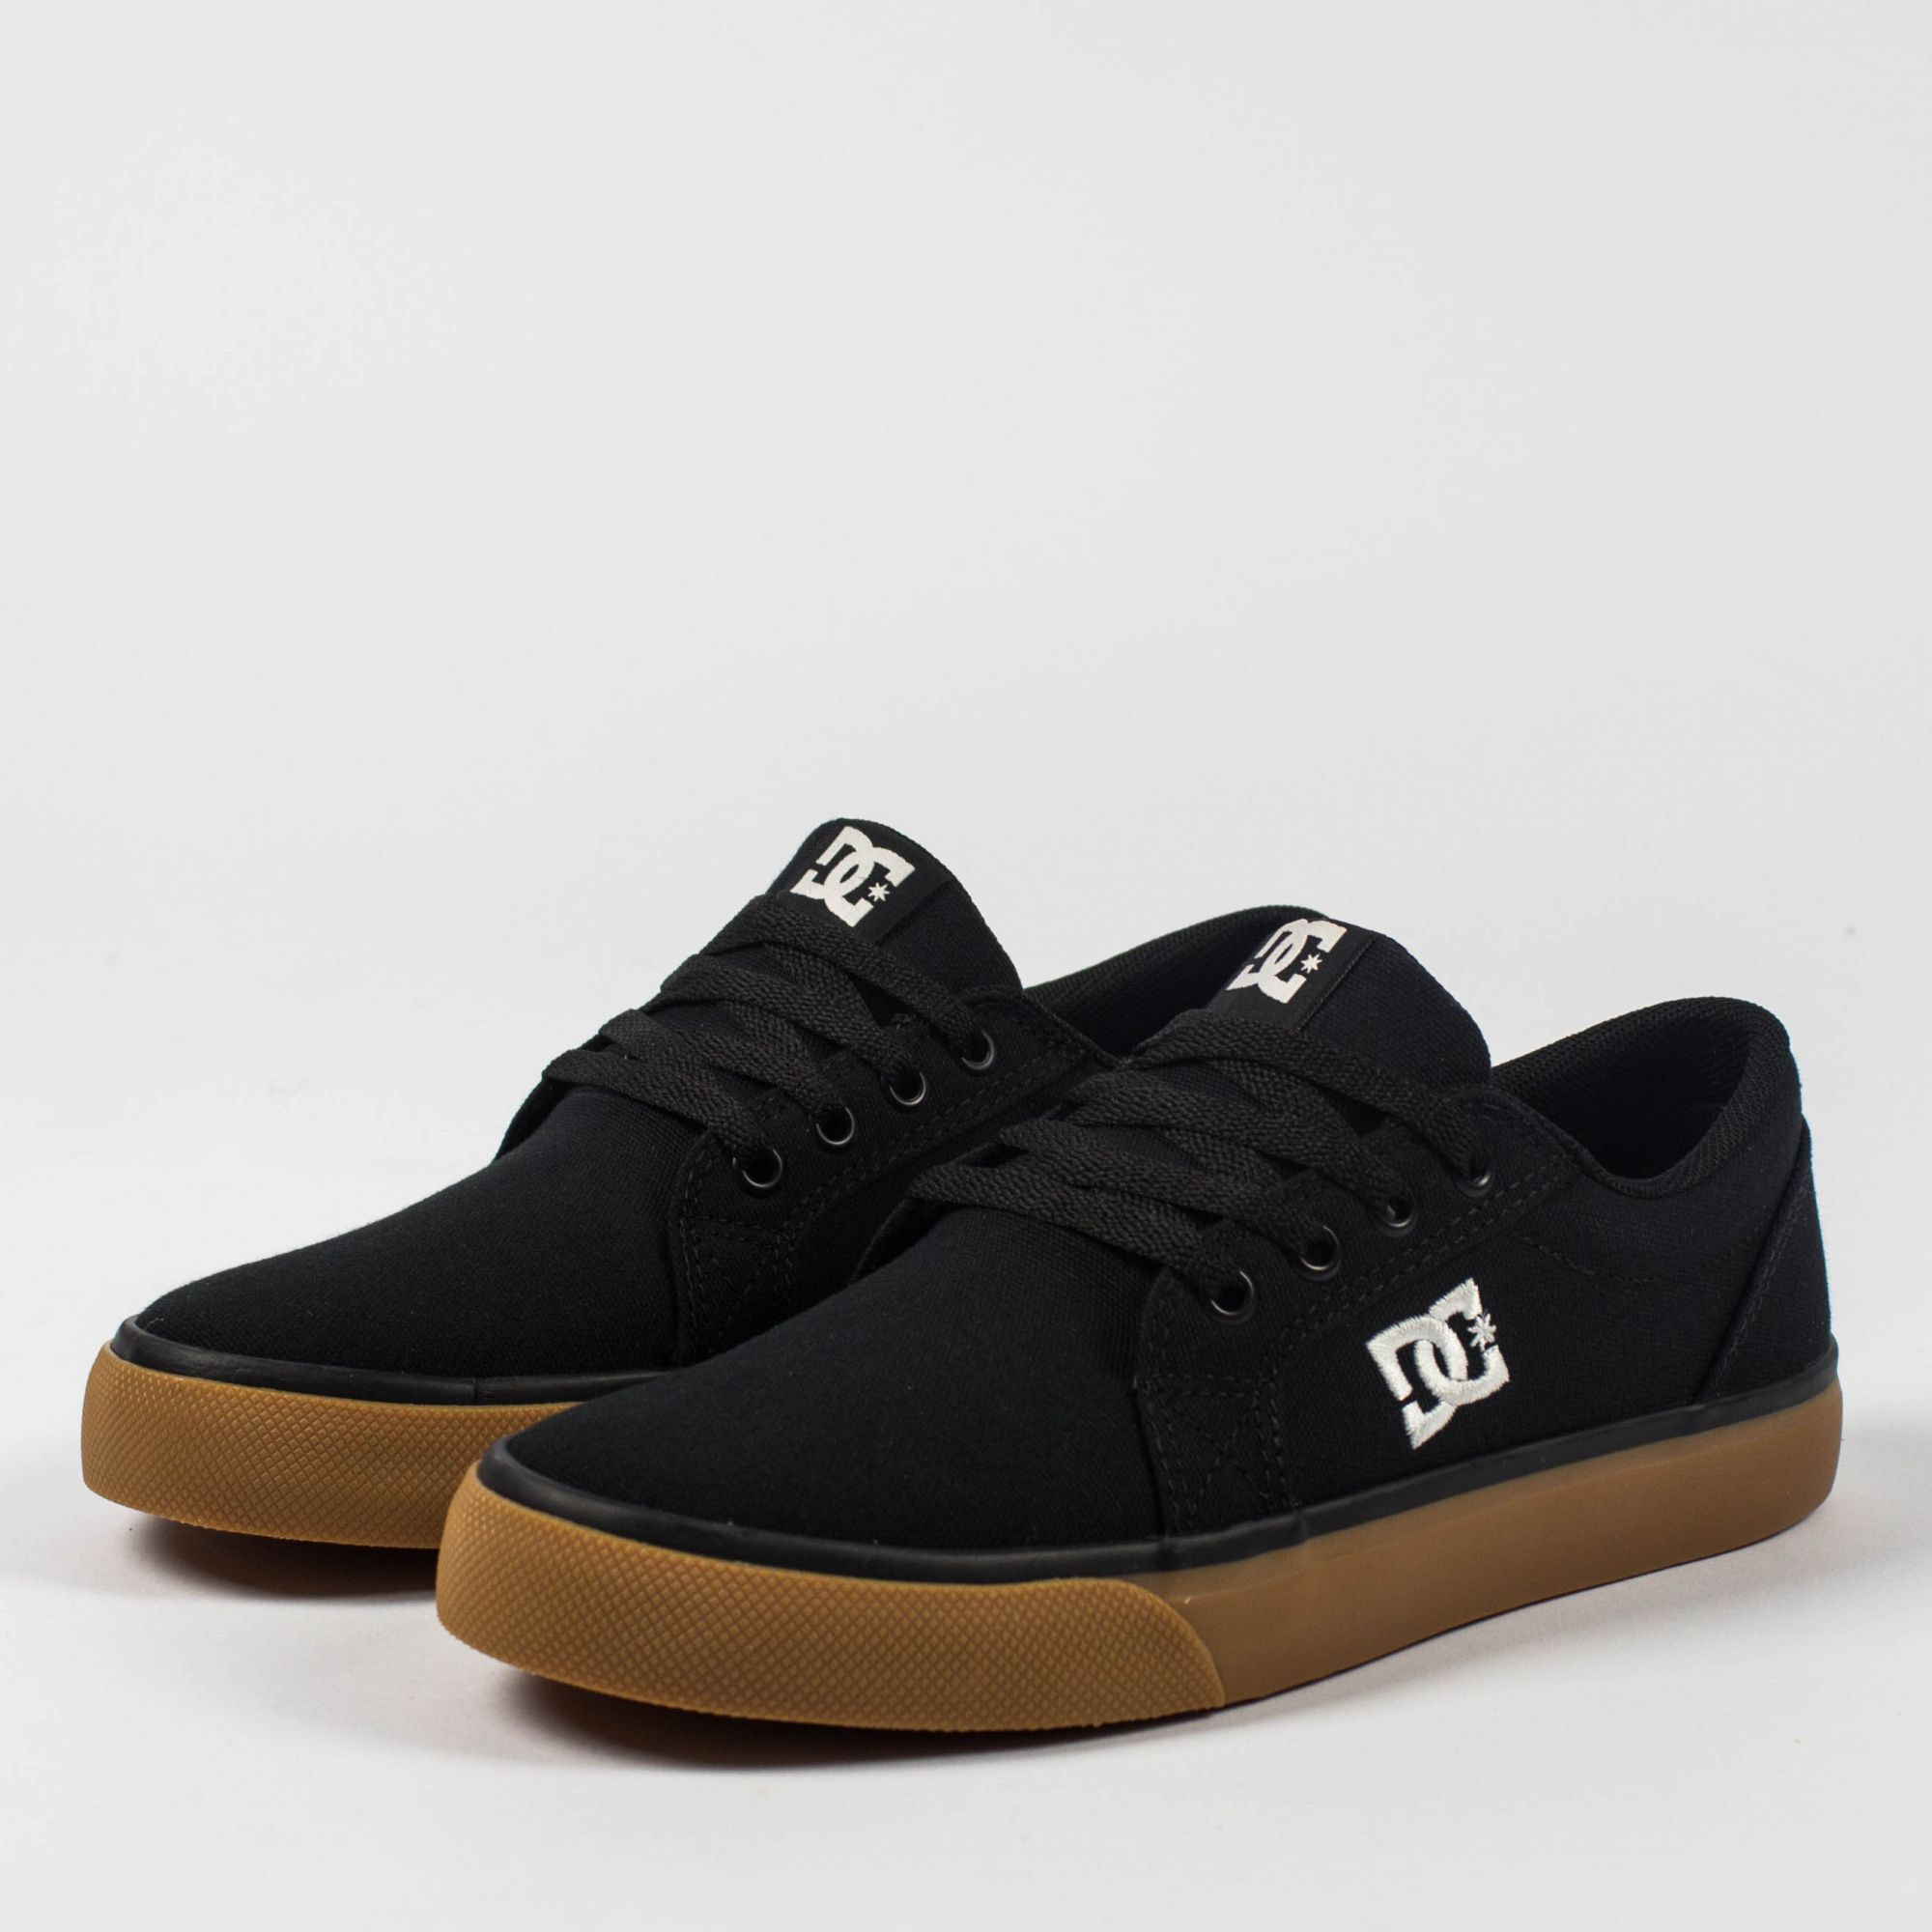 Tênis DC Shoes Episo Black Gum Preto